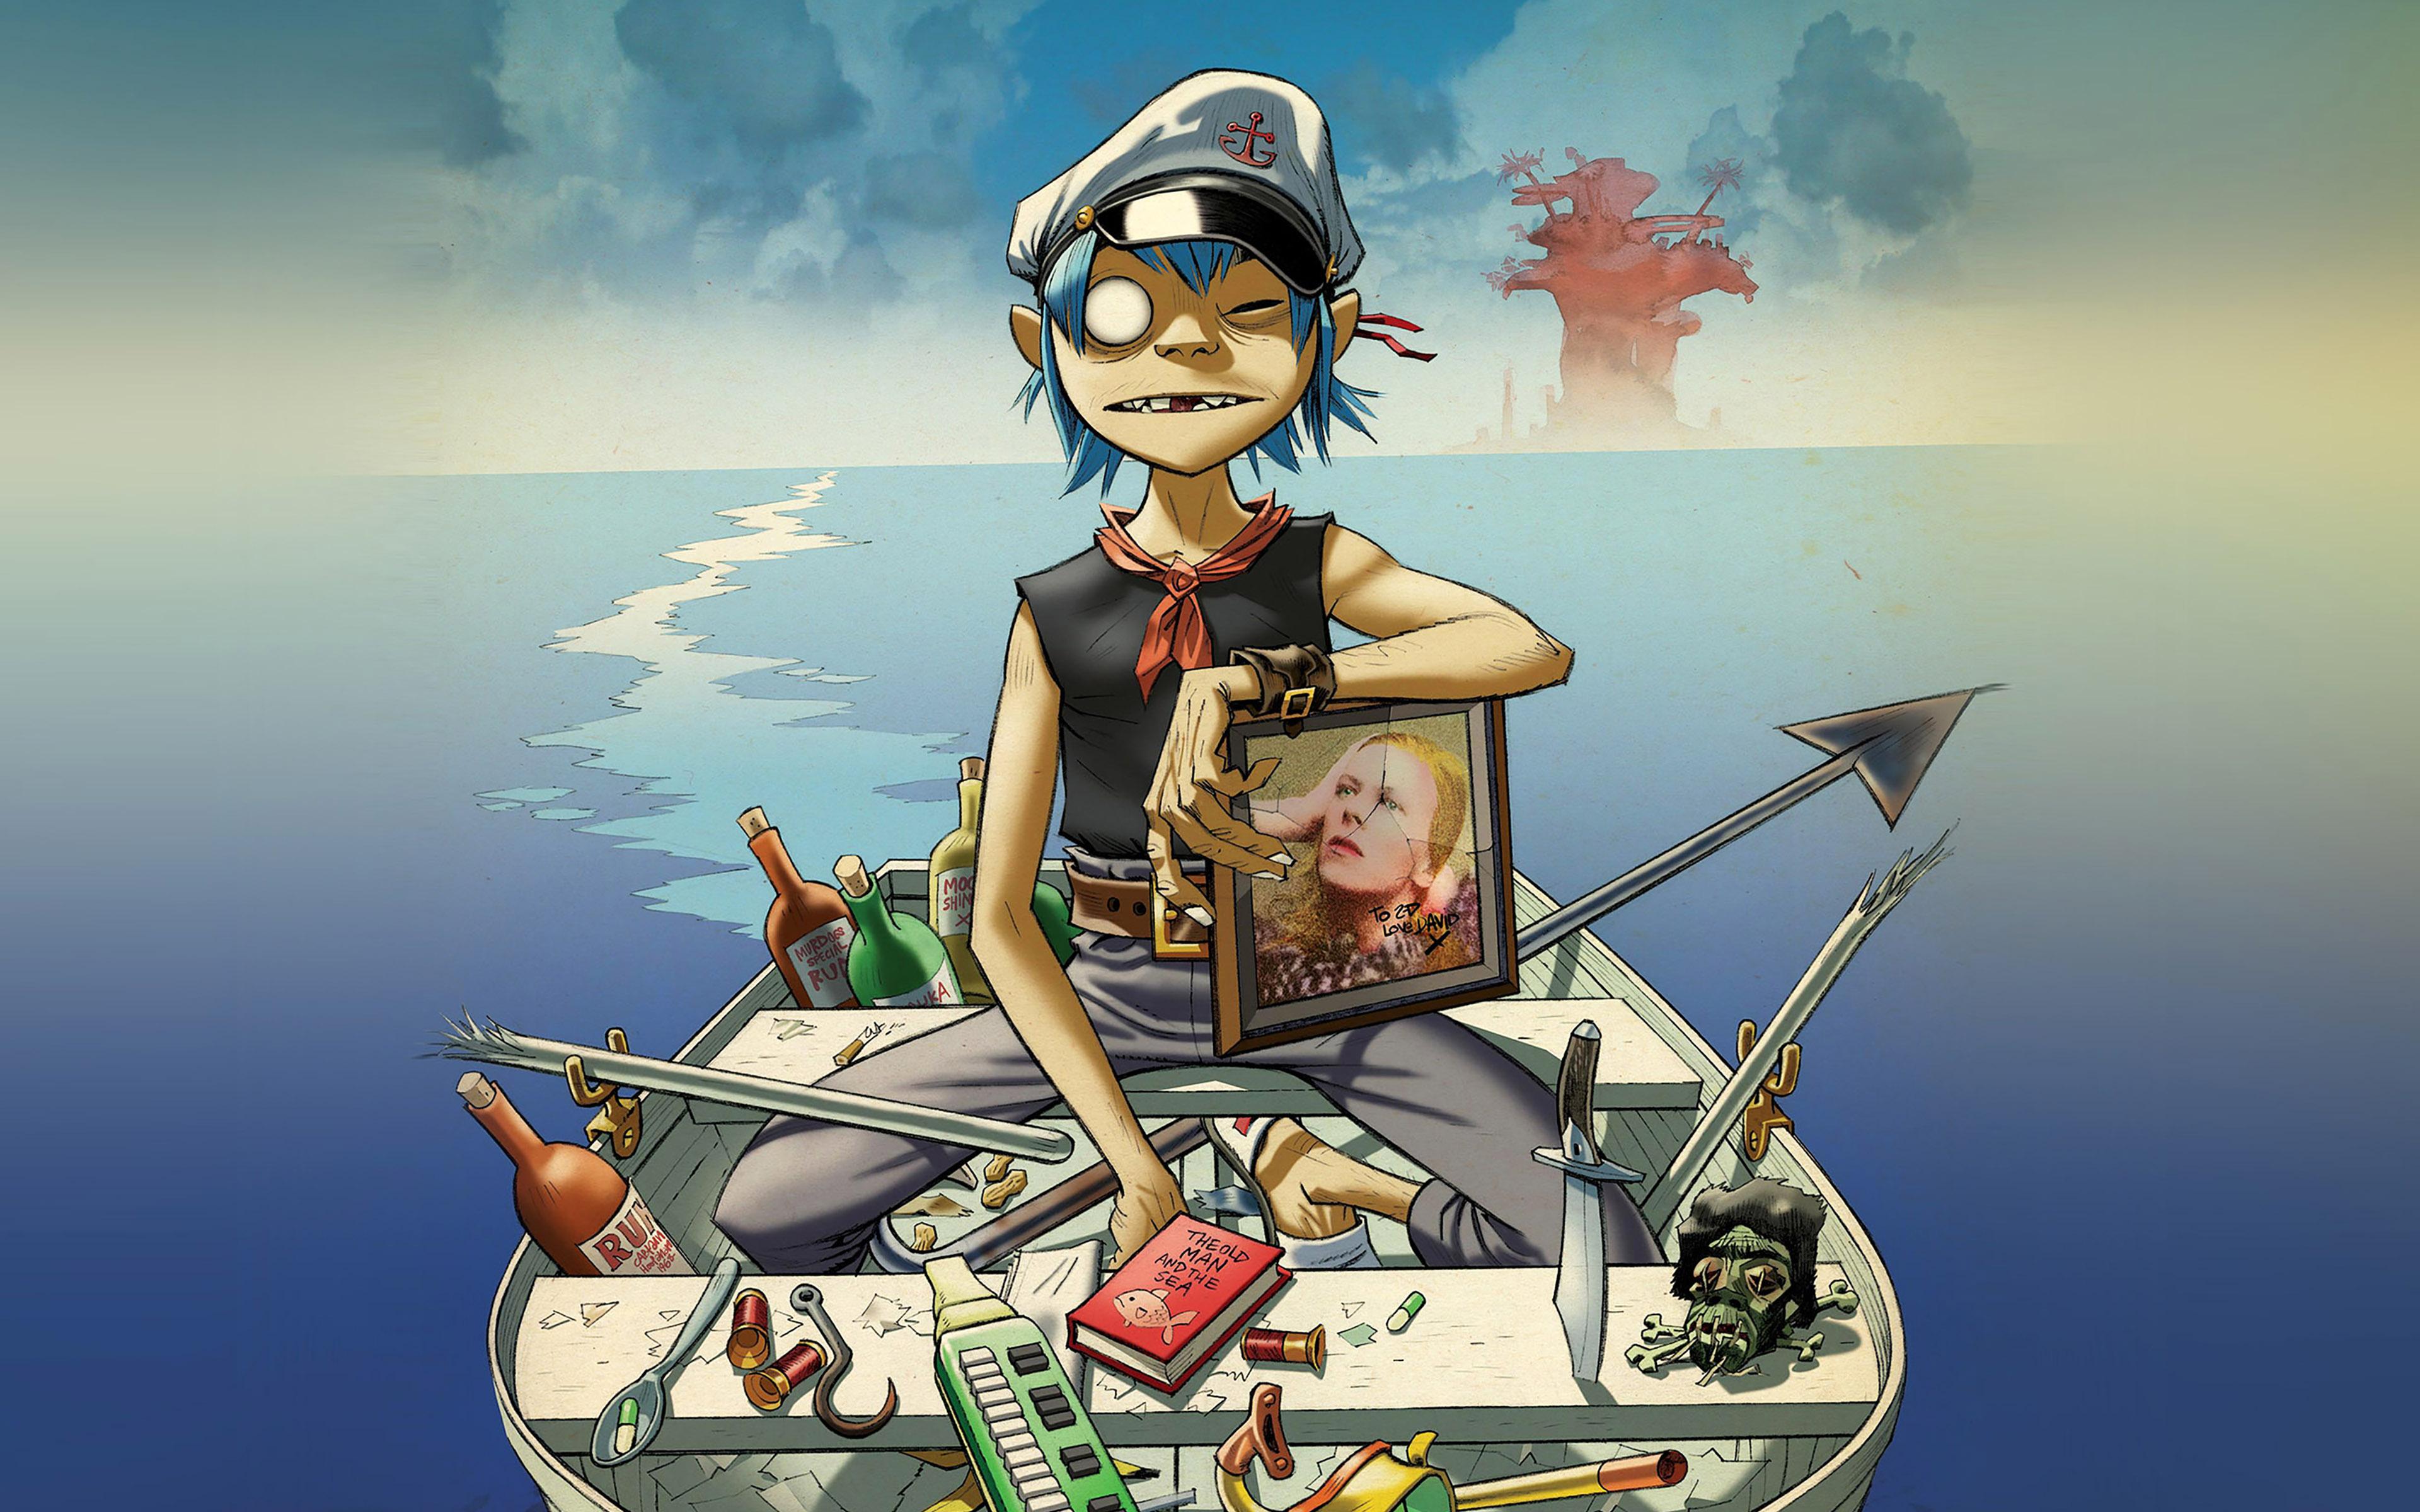 ab05-wallpaper-gorillaz-boat-illust-music